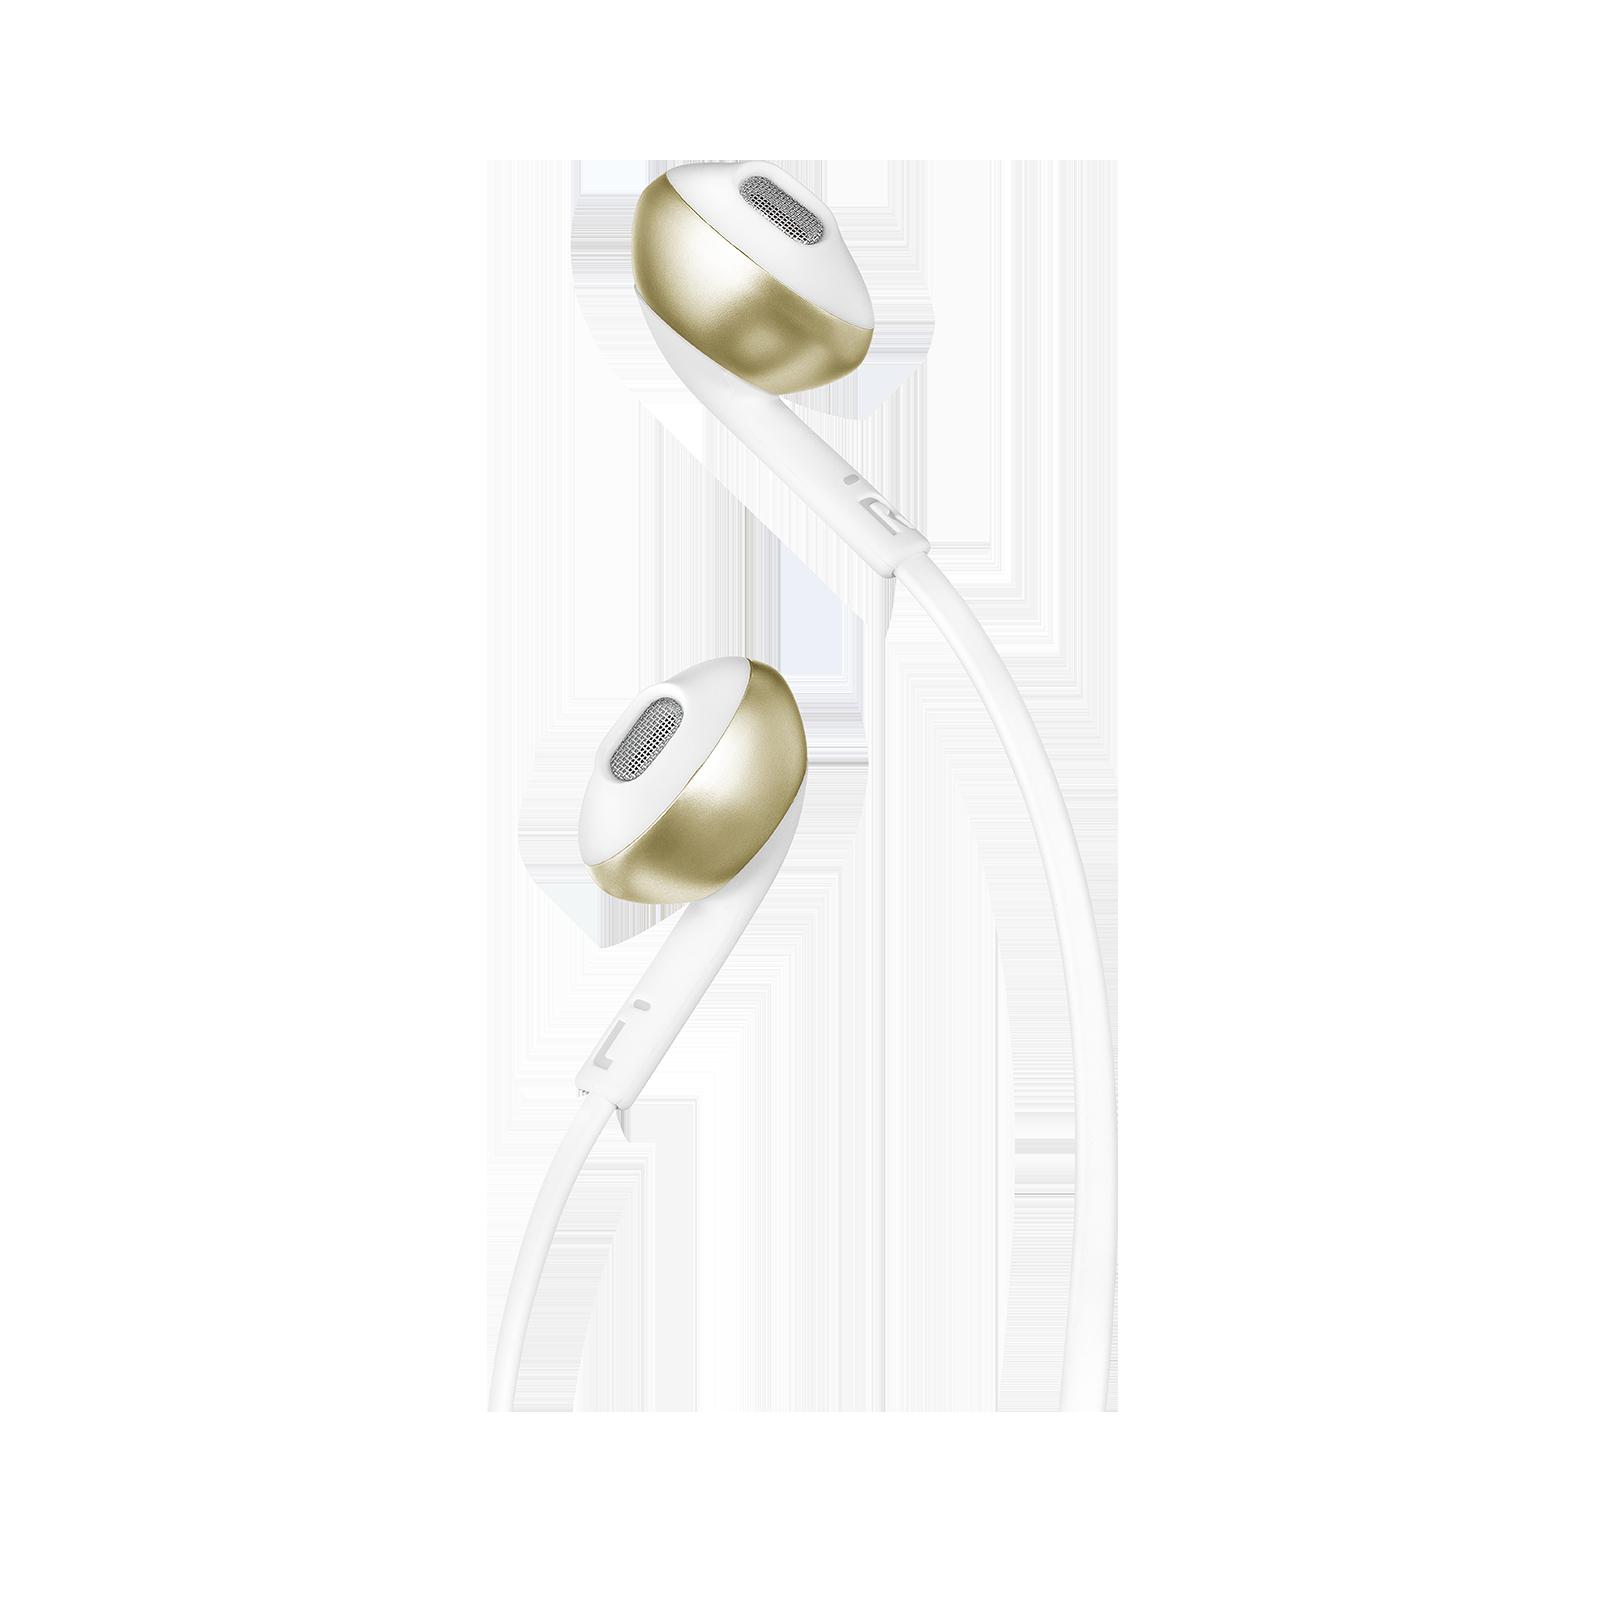 JBL TUNE 205BT - Champagne Gold - Wireless Earbud headphones - Detailshot 1